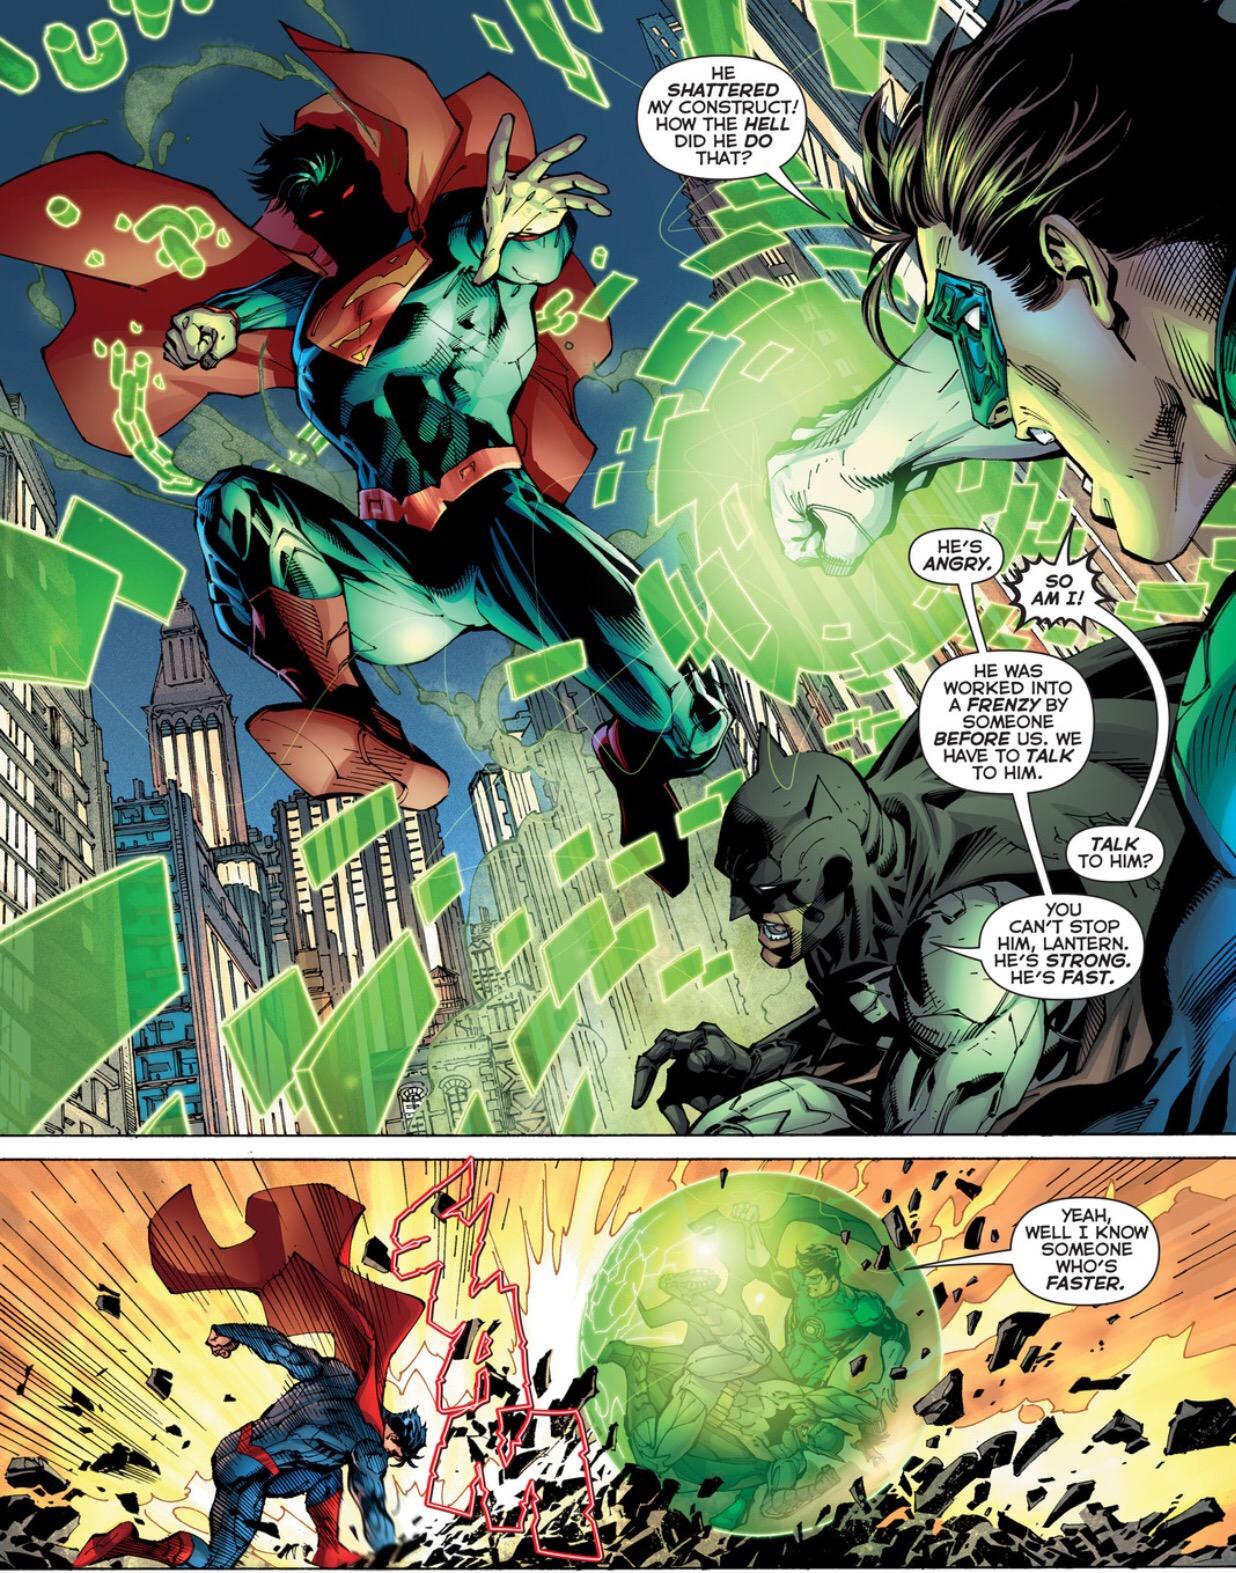 Superman vs green lantern - photo#13